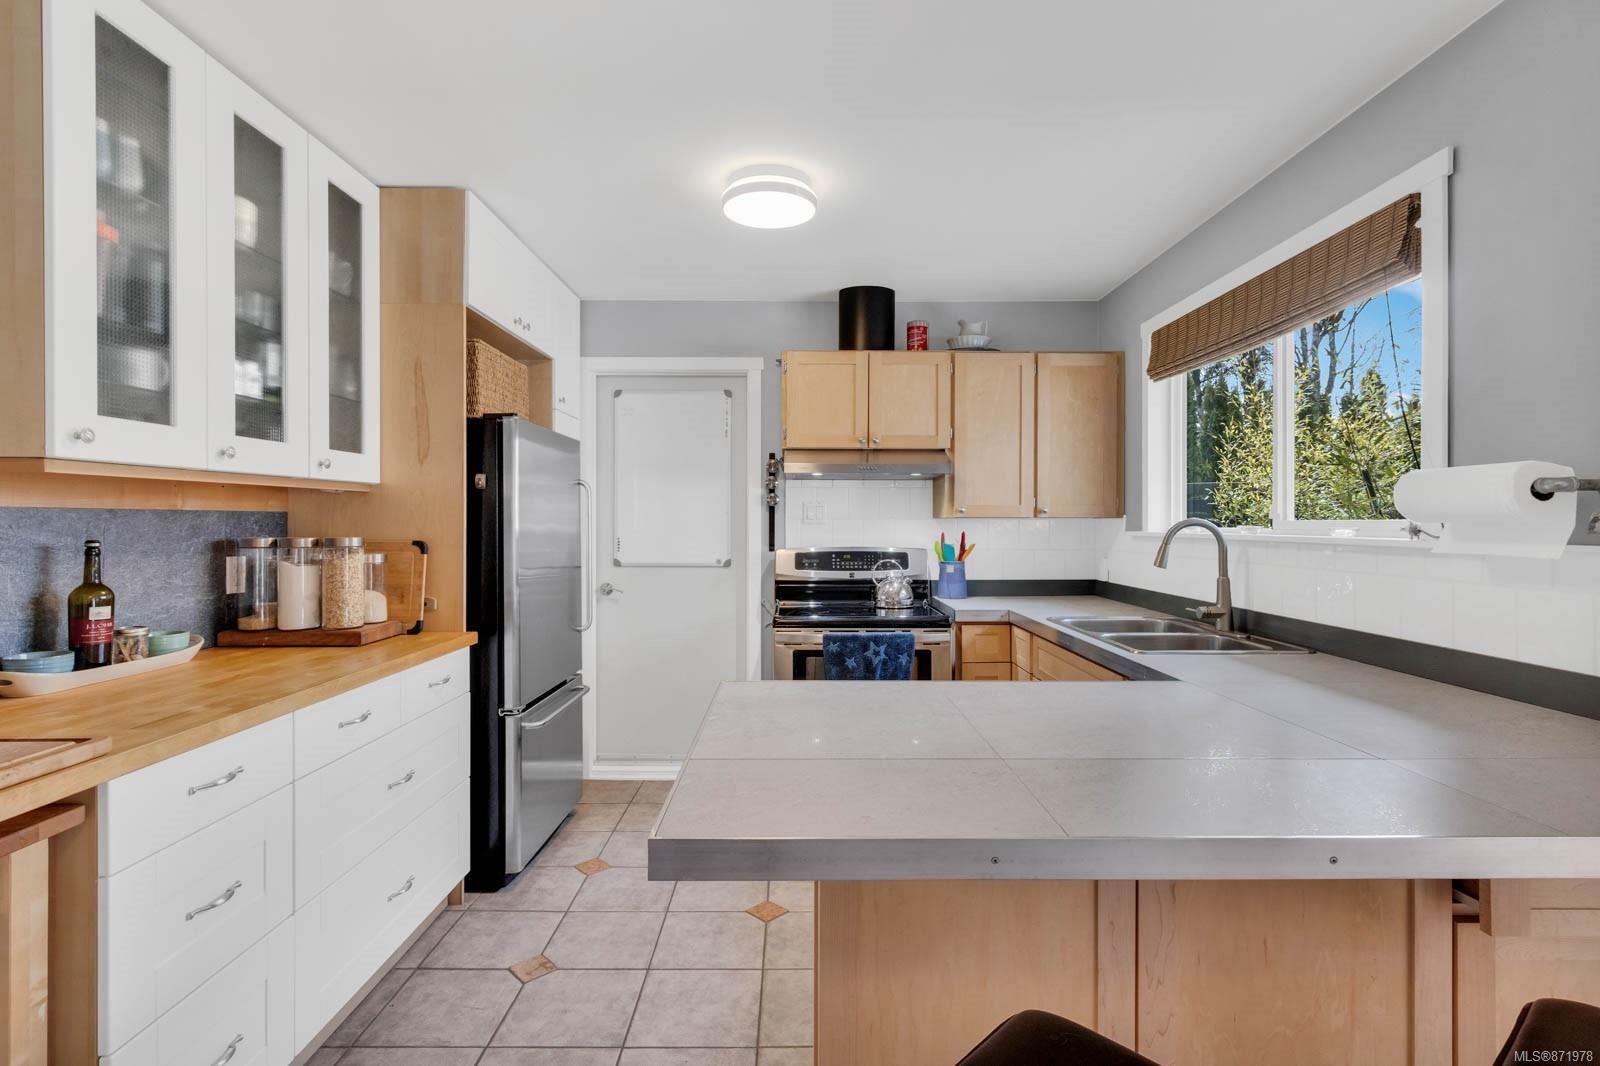 Photo 4: Photos: 1539 Chilcotin Cres in : CV Comox (Town of) House for sale (Comox Valley)  : MLS®# 871978